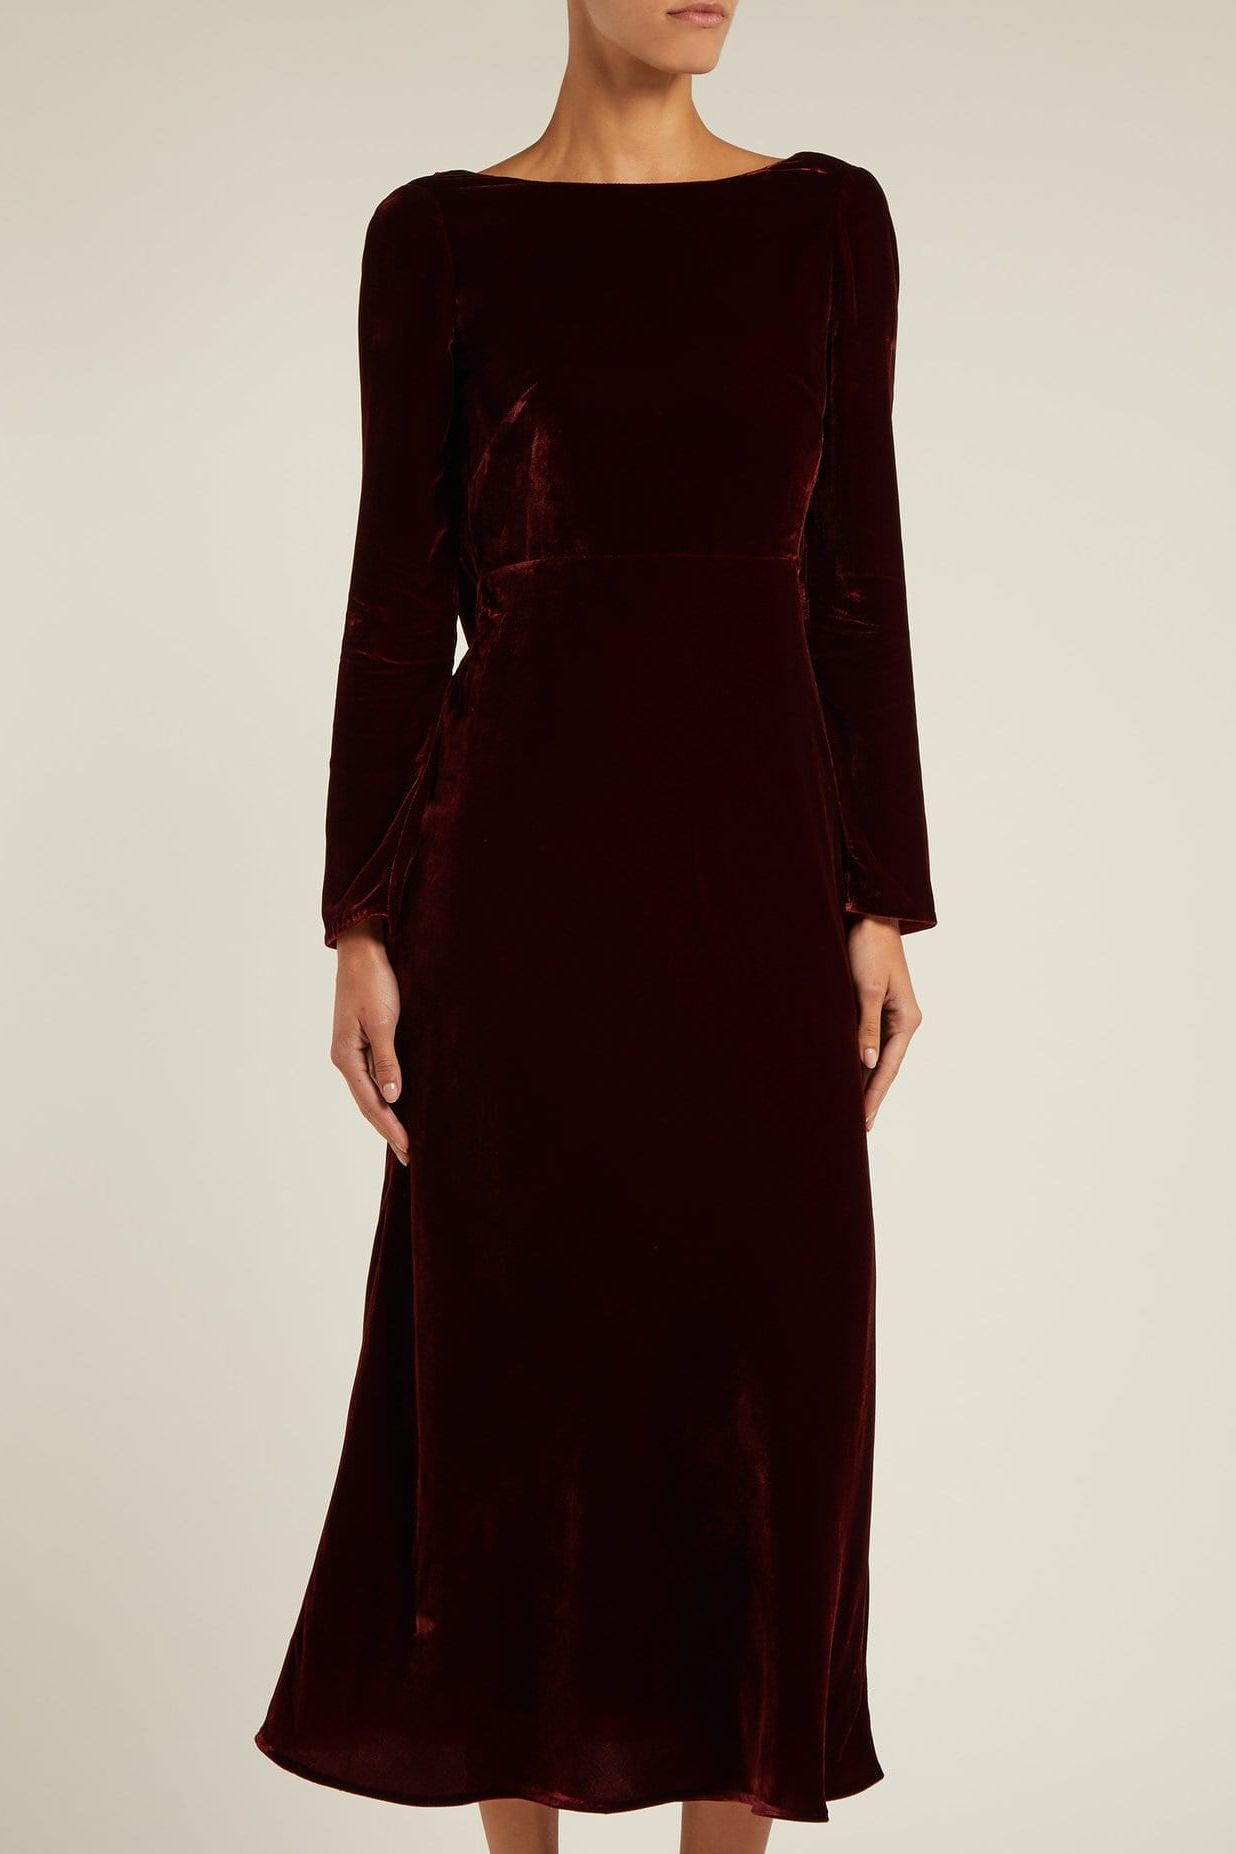 Saloni Tina Boat-Neck Velvet Dress 2 Preview Images